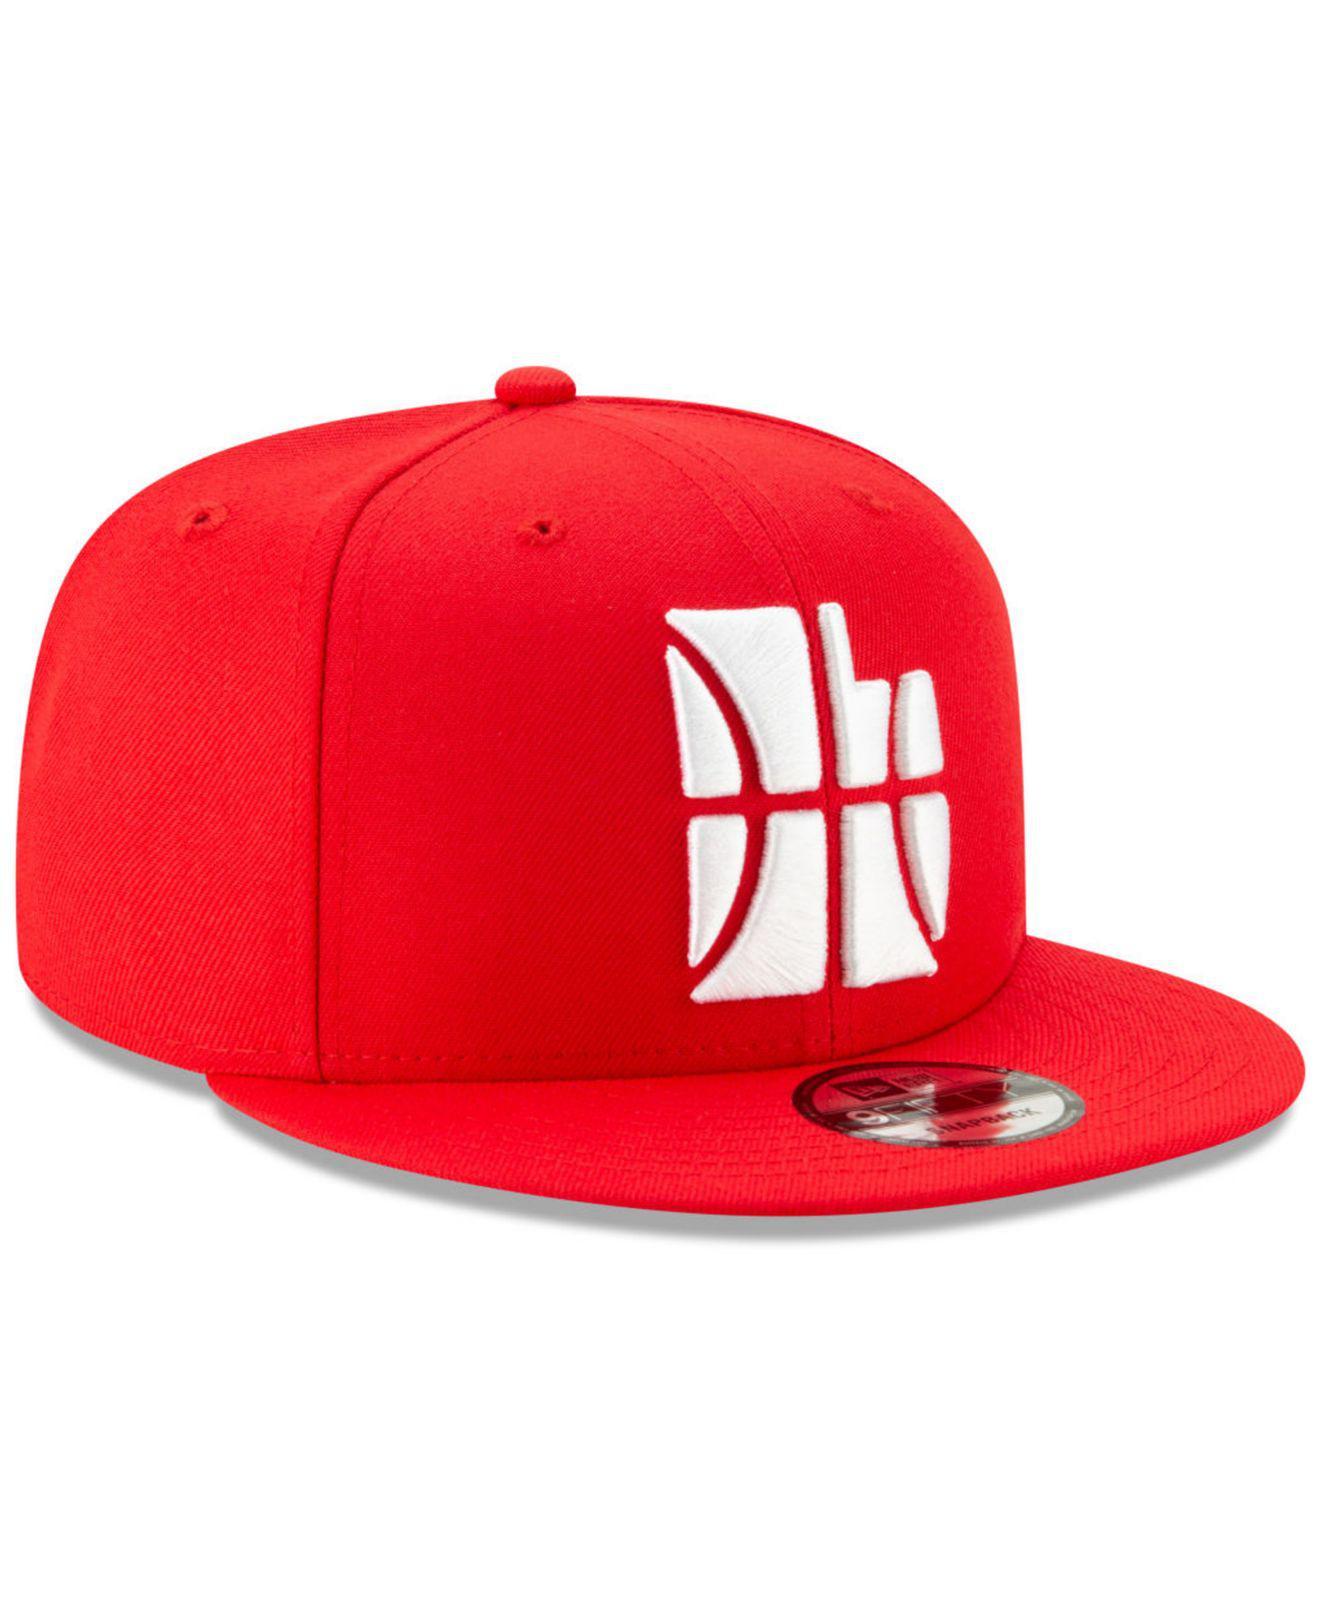 Lyst - Ktz Utah Jazz City Series 2.0 9fifty Snapback Cap in Red for Men b4dda84b3